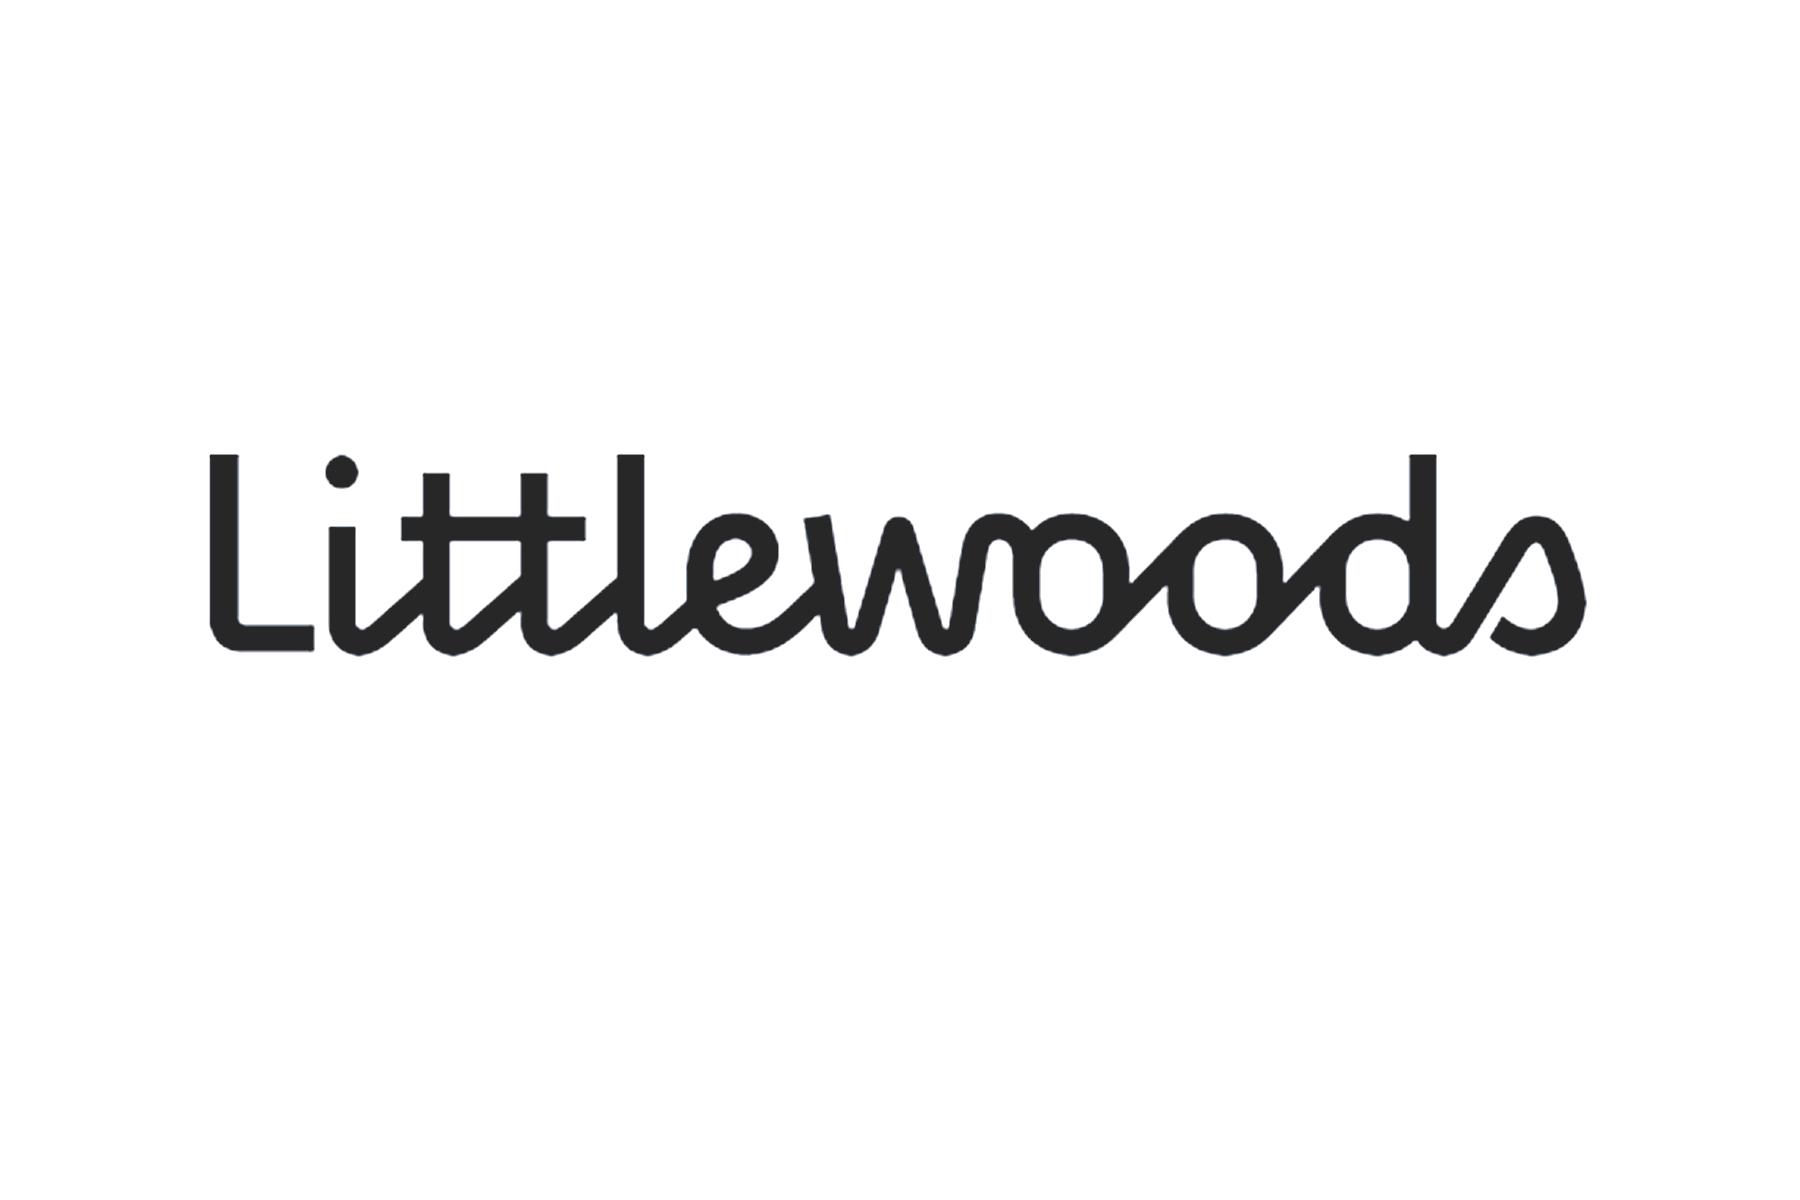 Littlewoods discount code 10% off until 31st December